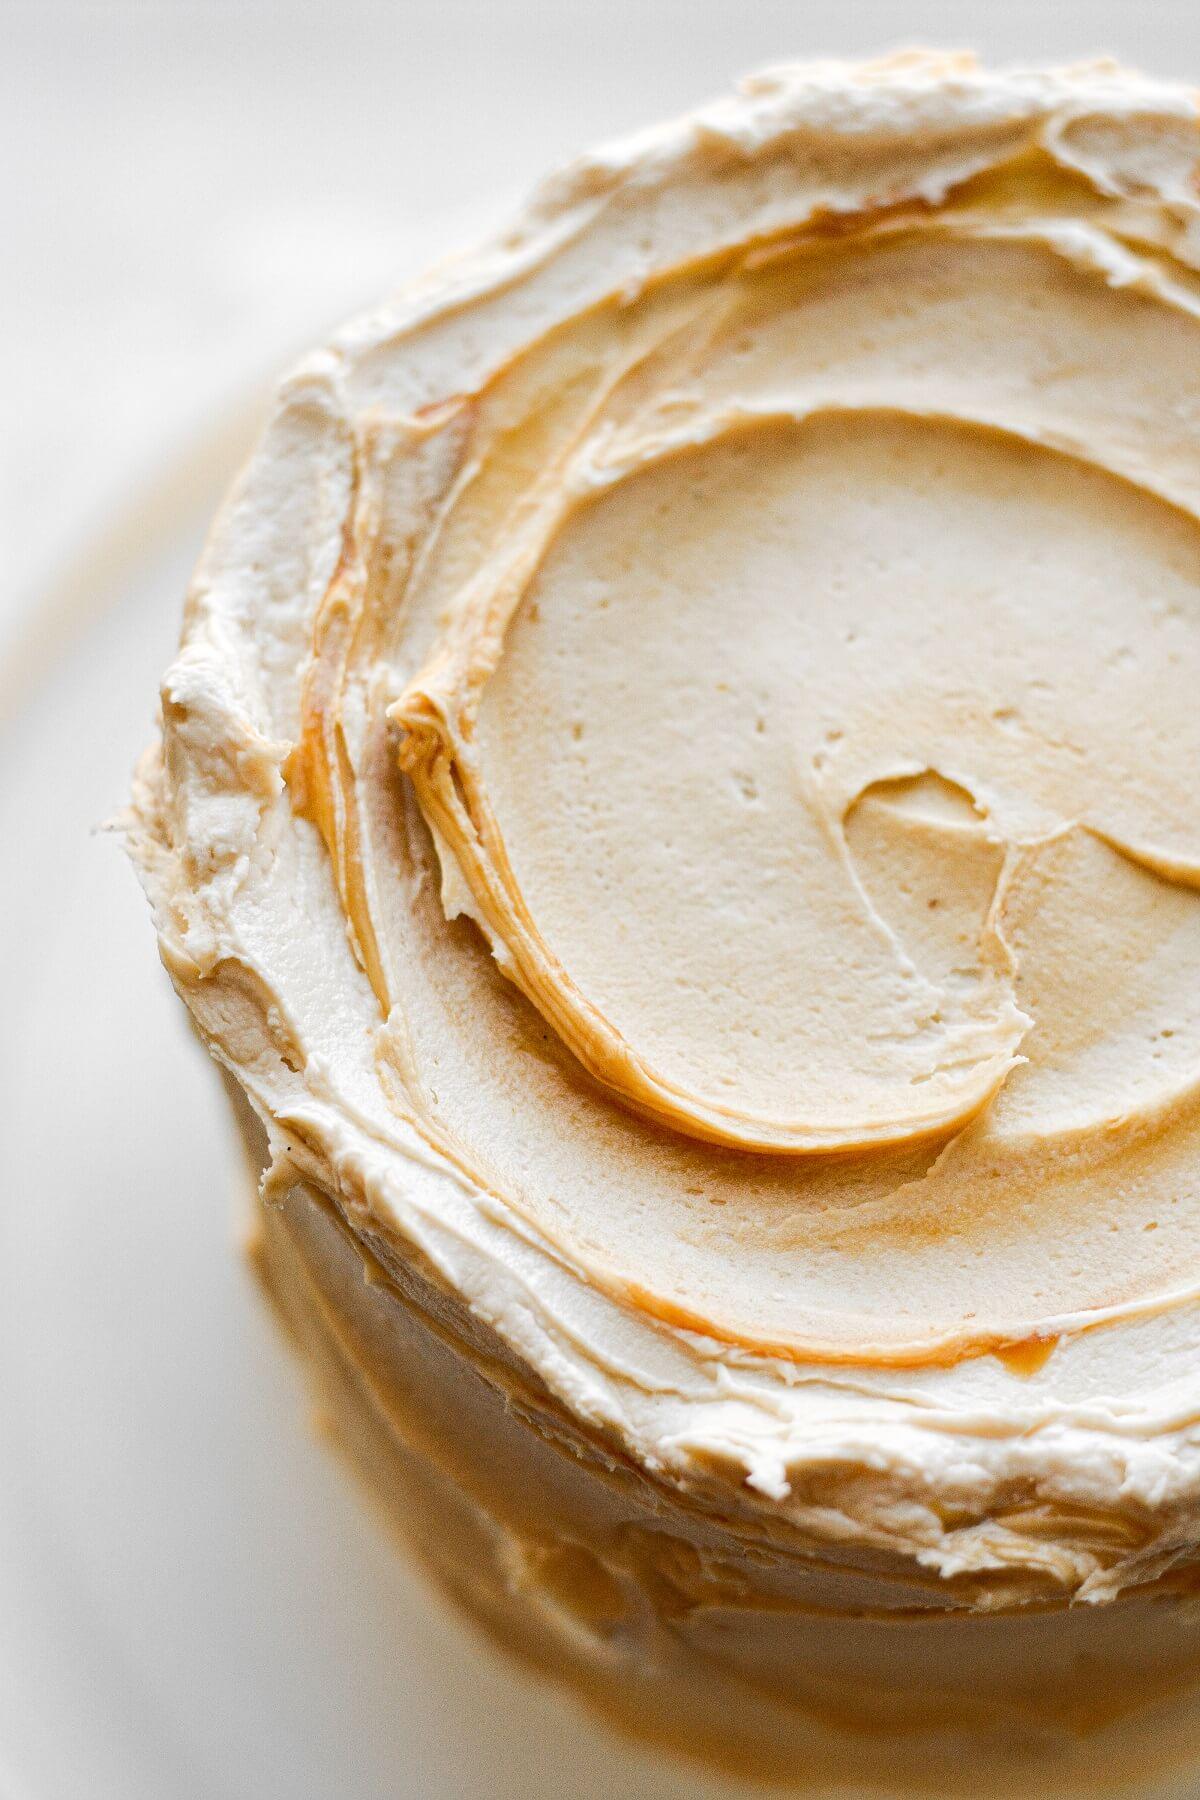 Swirls of salted caramel buttercream on a cake.